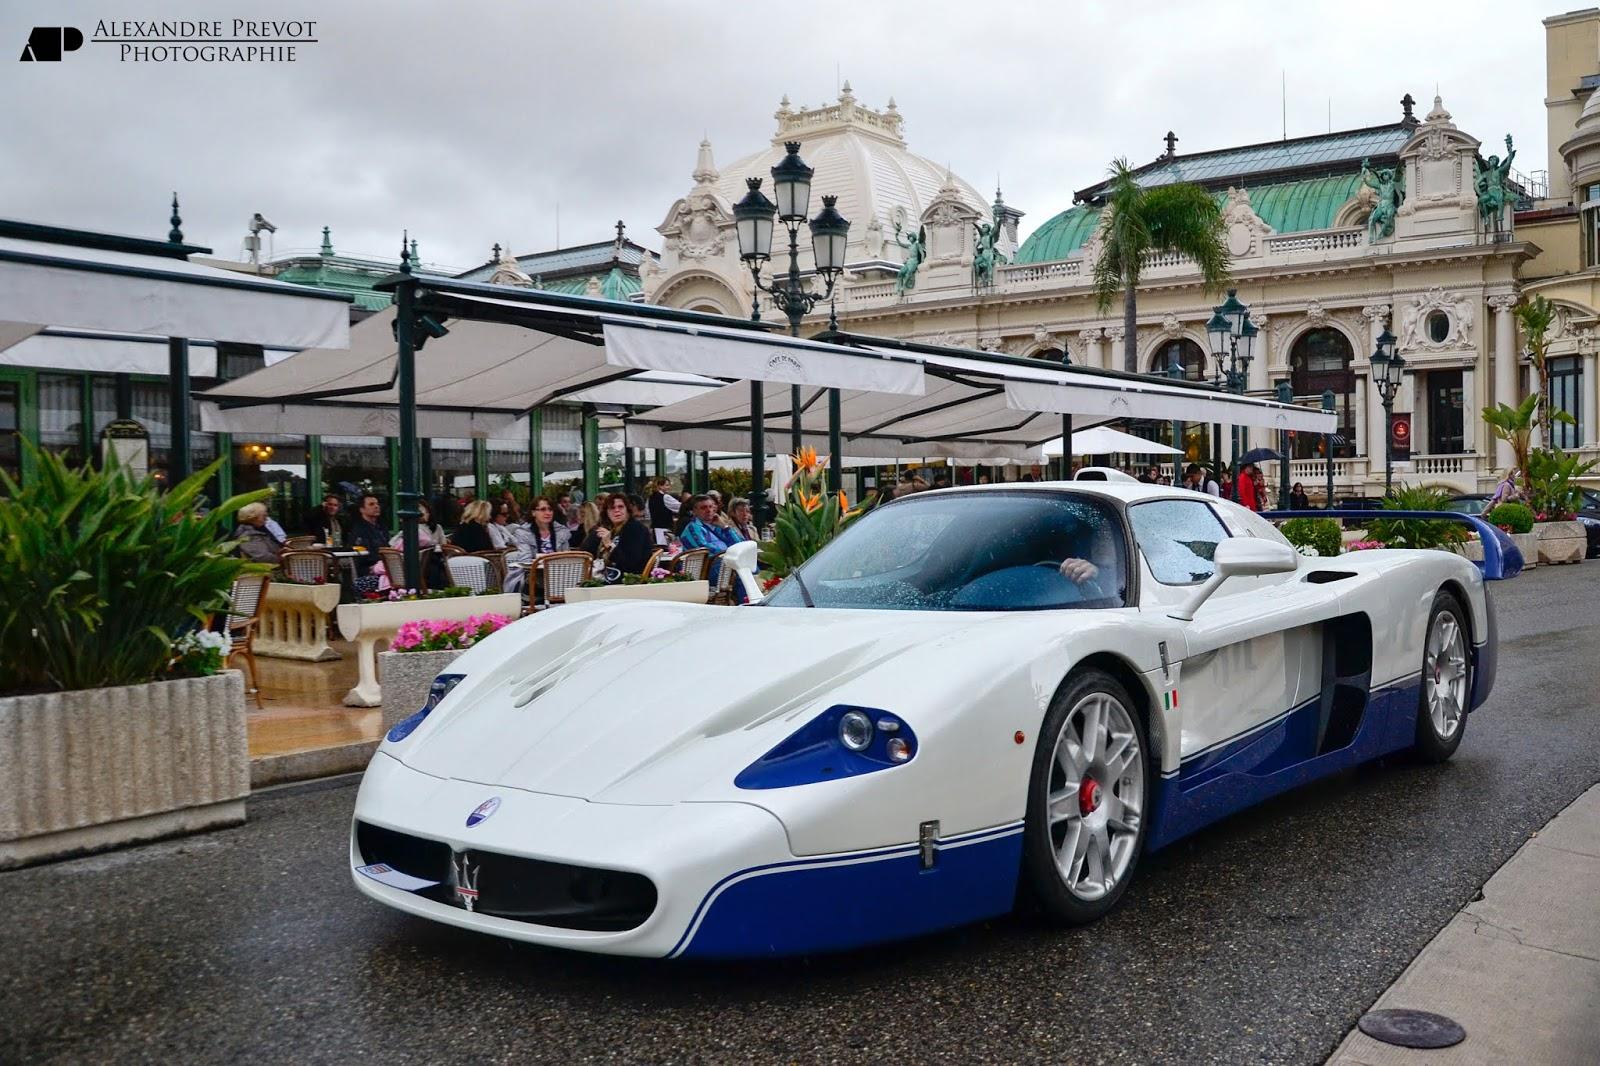 Maserati MC12 252886750418422529 Maserati MC12. Η Enzo Aperta. Maserati, Maserati MC12, MC12, retrocar, retrocar sunday, zblog